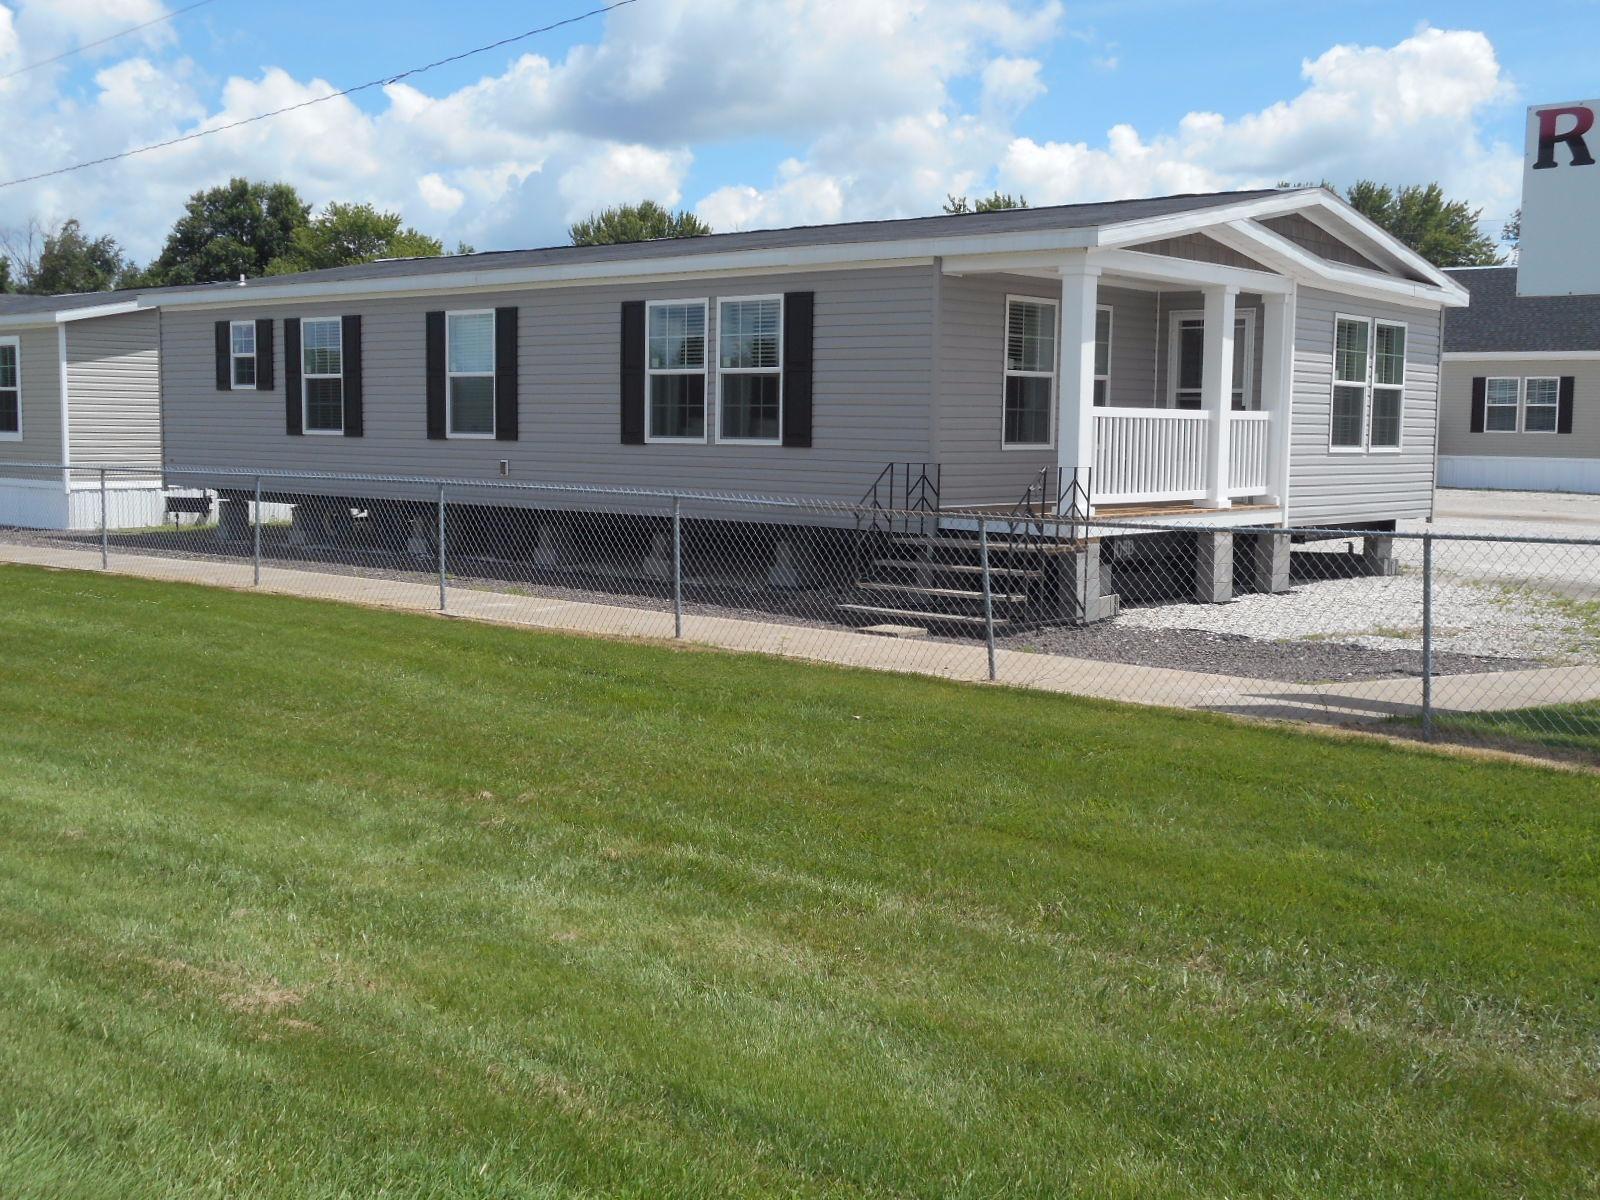 Ramsey Jones Homes, Inc. - LaGrange, MO - Company Profile